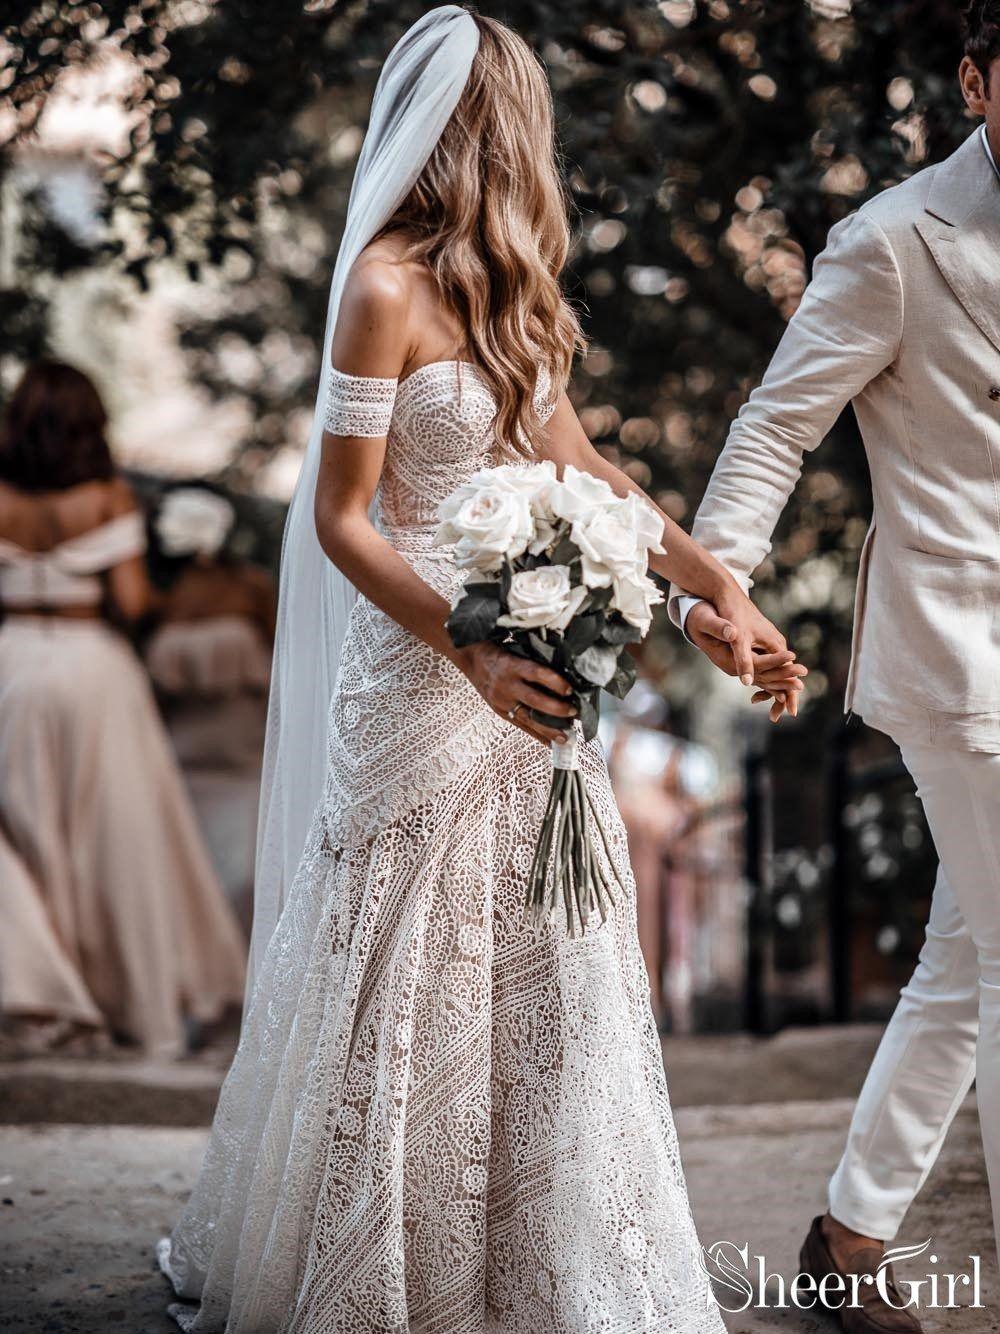 Ivory Lace Beach Wedding Dresses Sweetheart Neck Rustic Boho Wedding Dresses Awd1156 Lace Beach Wedding Dress Boho Wedding Dress Lace Wedding Dress Train [ 1334 x 1000 Pixel ]